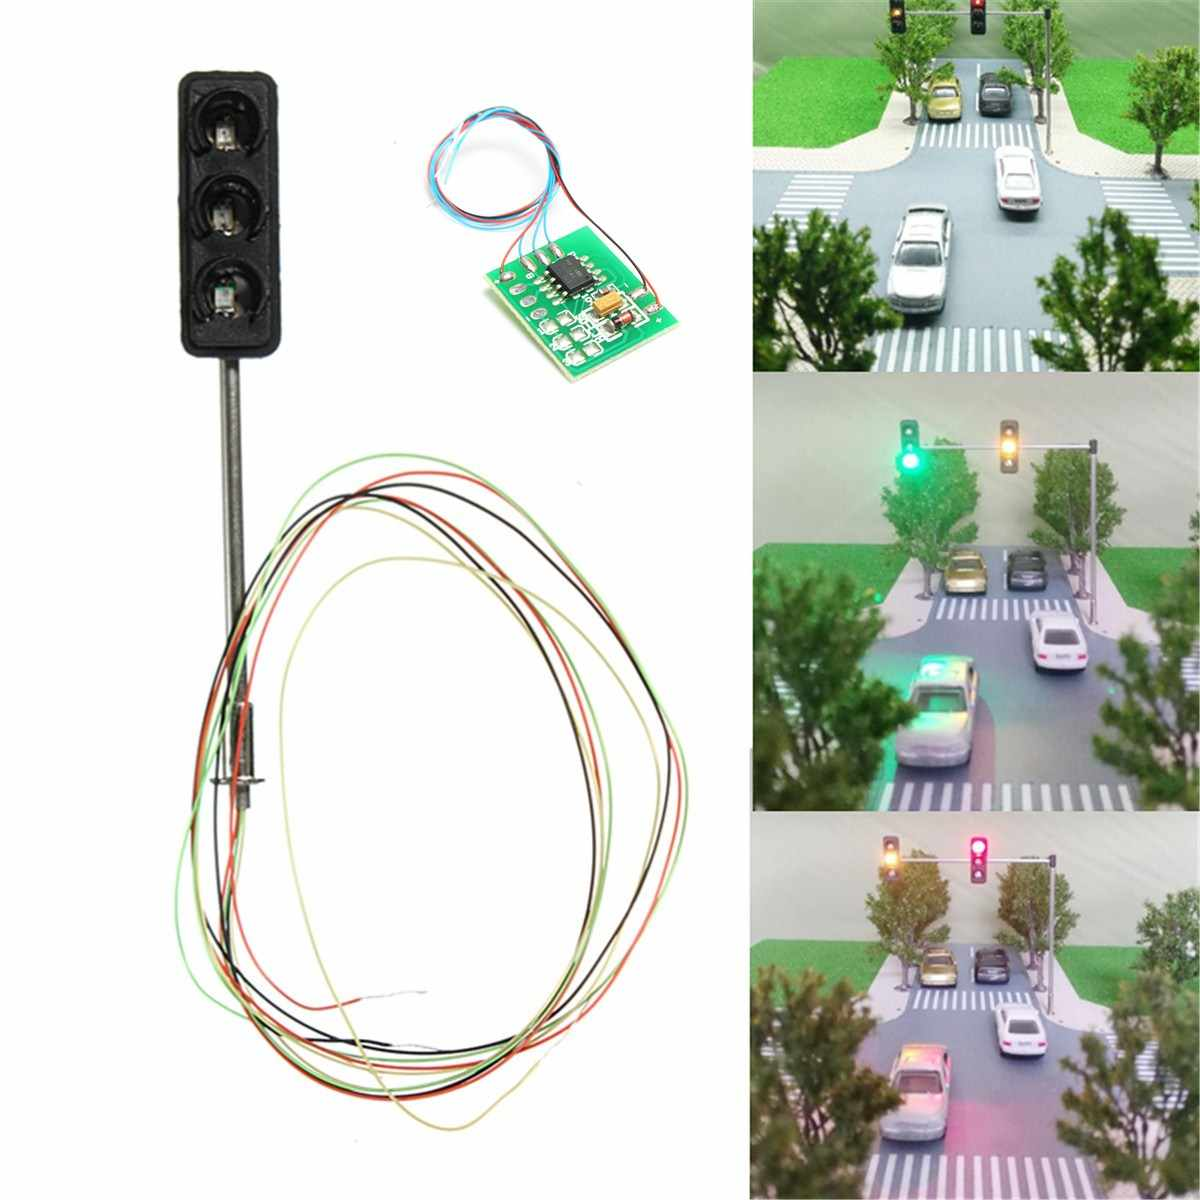 1Set de señal de luz de tráfico escala HO OO LED modelo de arquitectura tren de ferrocarril cruce de la calle + placa de circuito